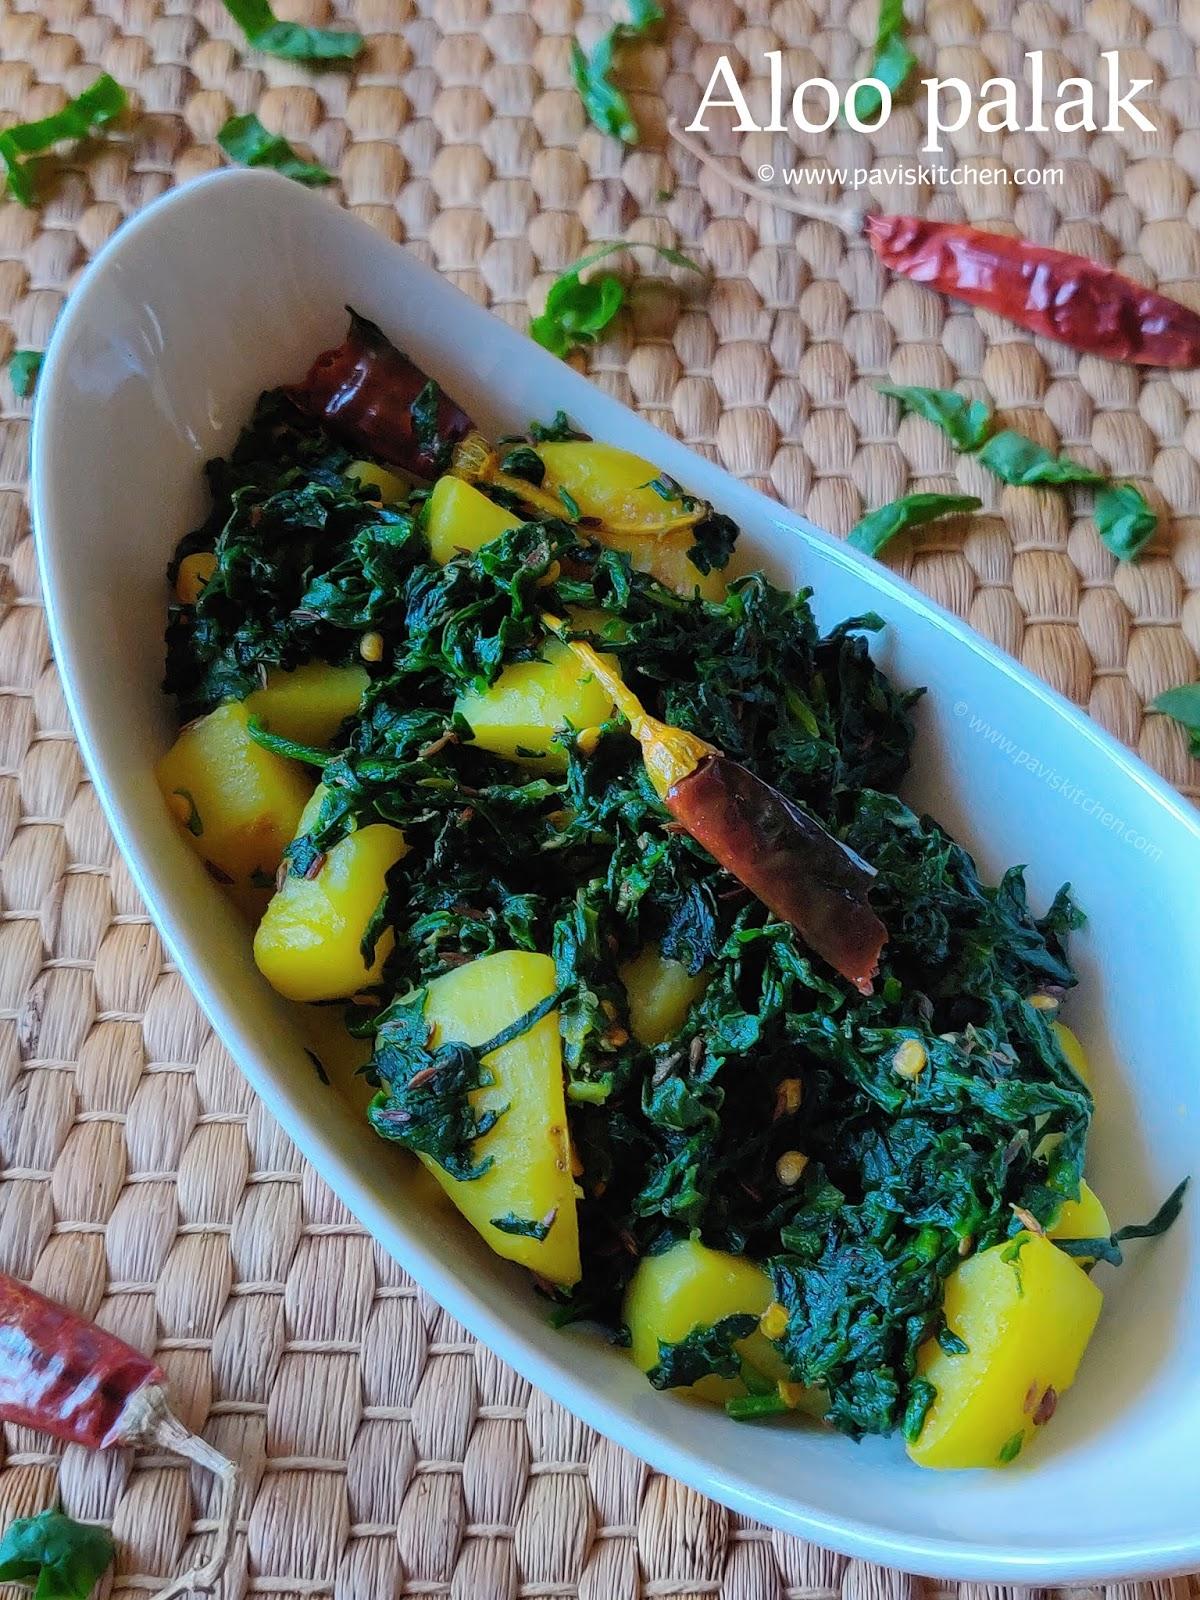 Aloo palak Dry Recipe | Spinach Potato Dry Curry